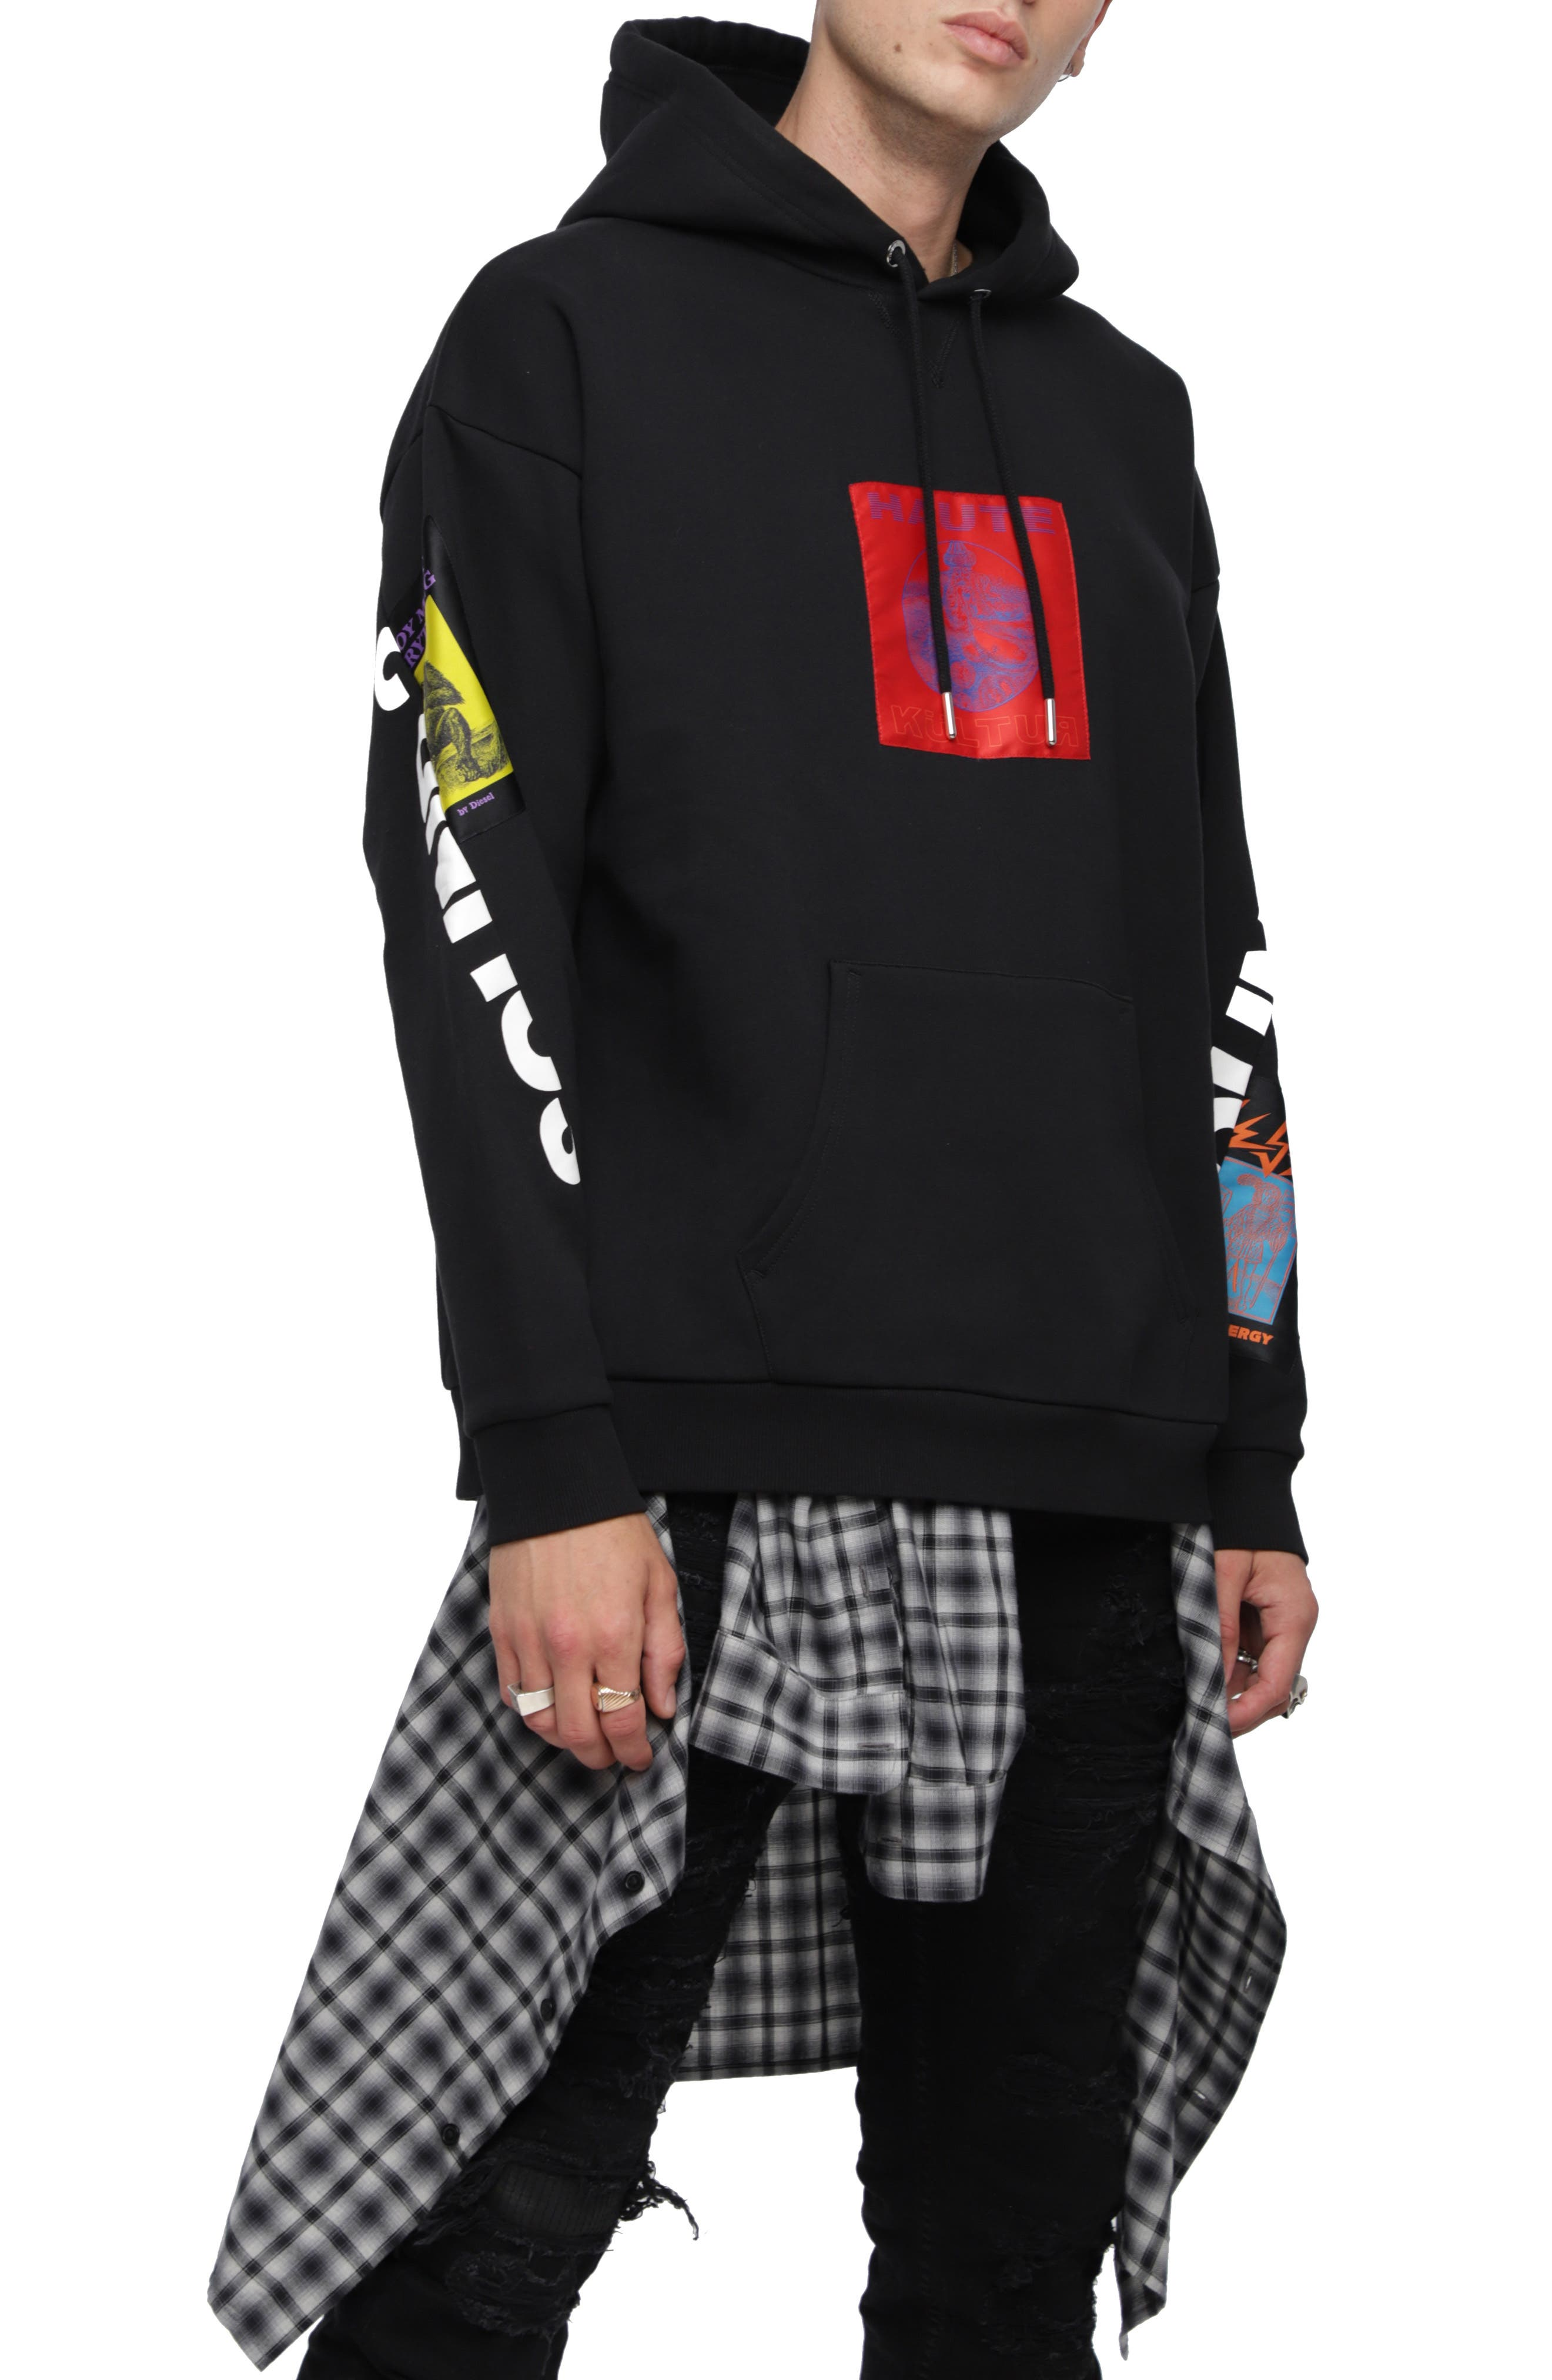 S-JACK-XA Hoodie Sweatshirt,                             Main thumbnail 1, color,                             001